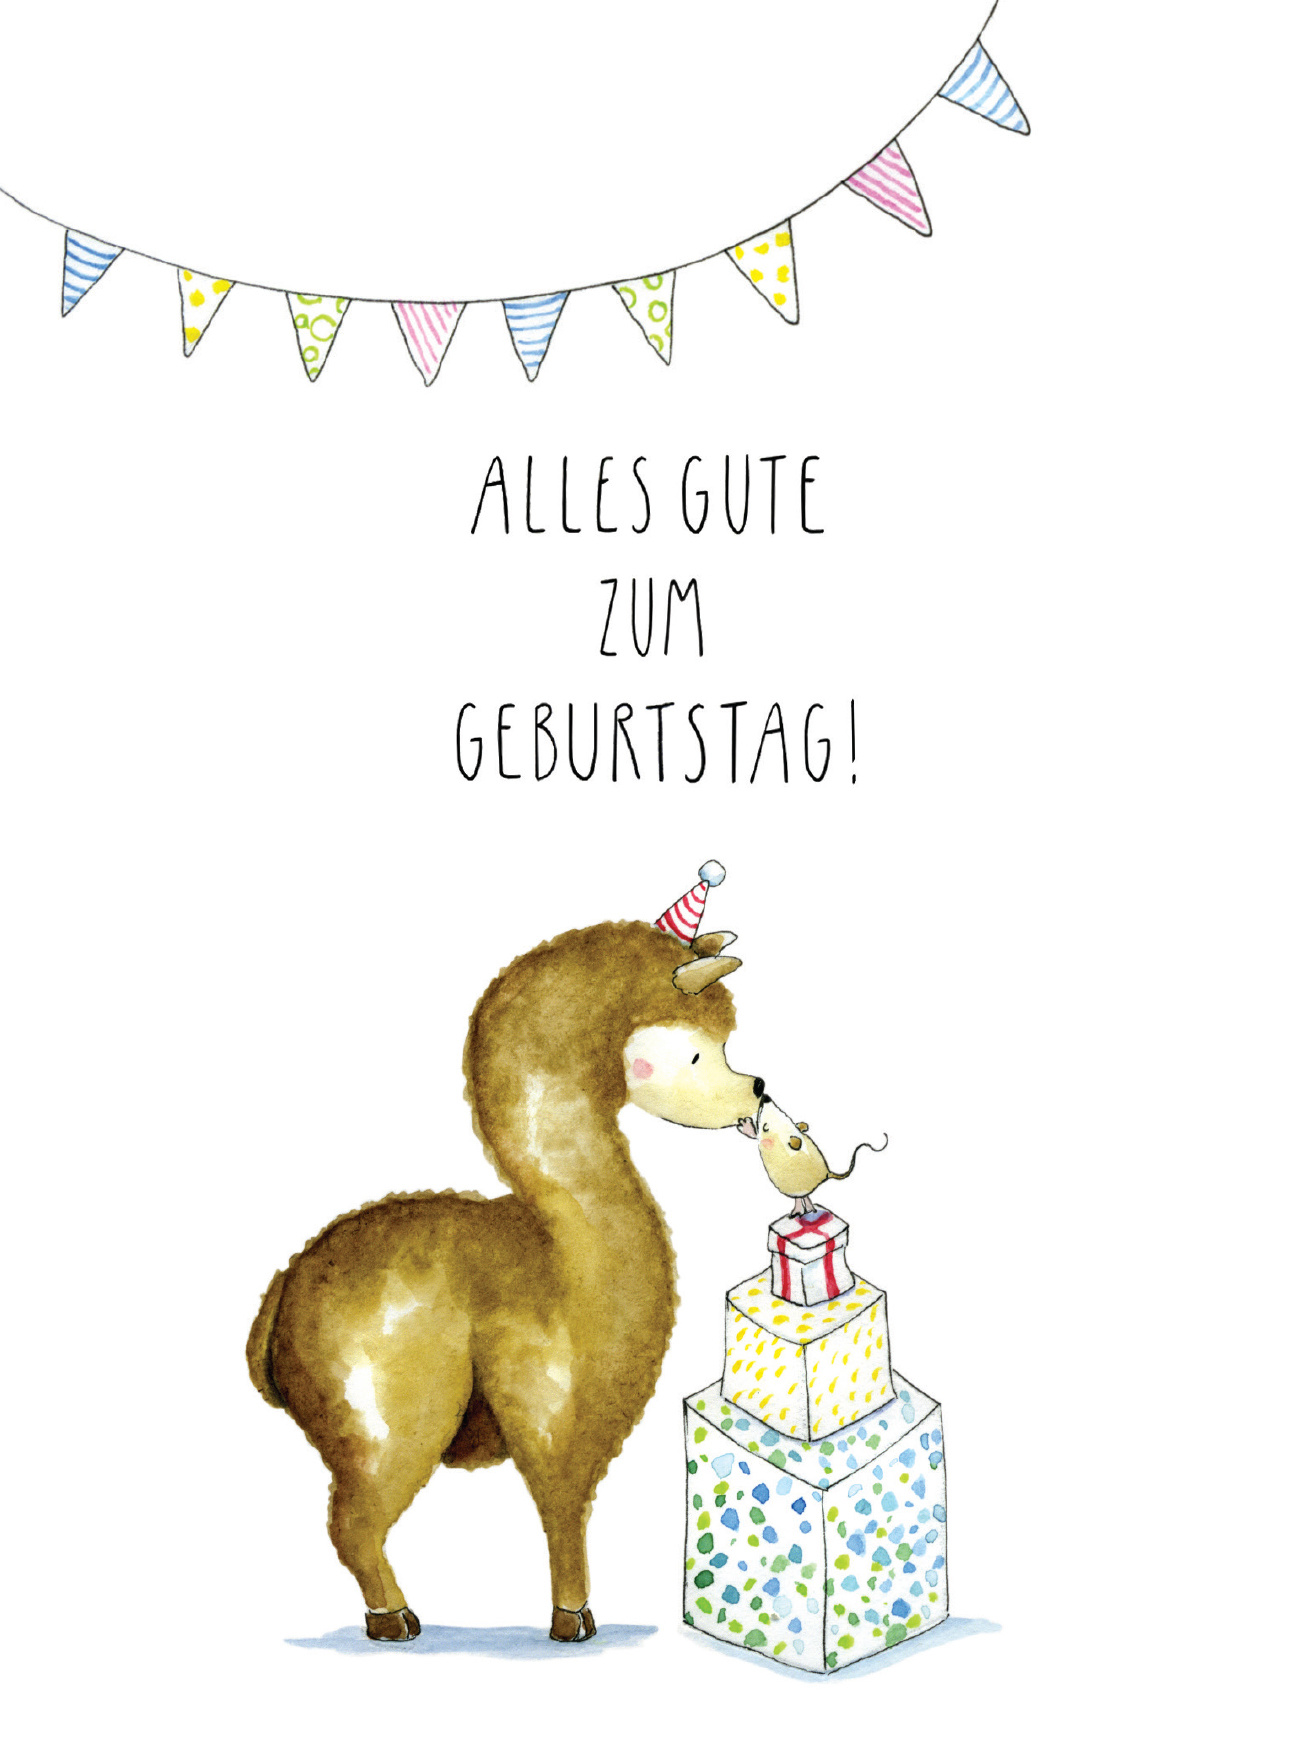 Geburttag Geburtstag translation